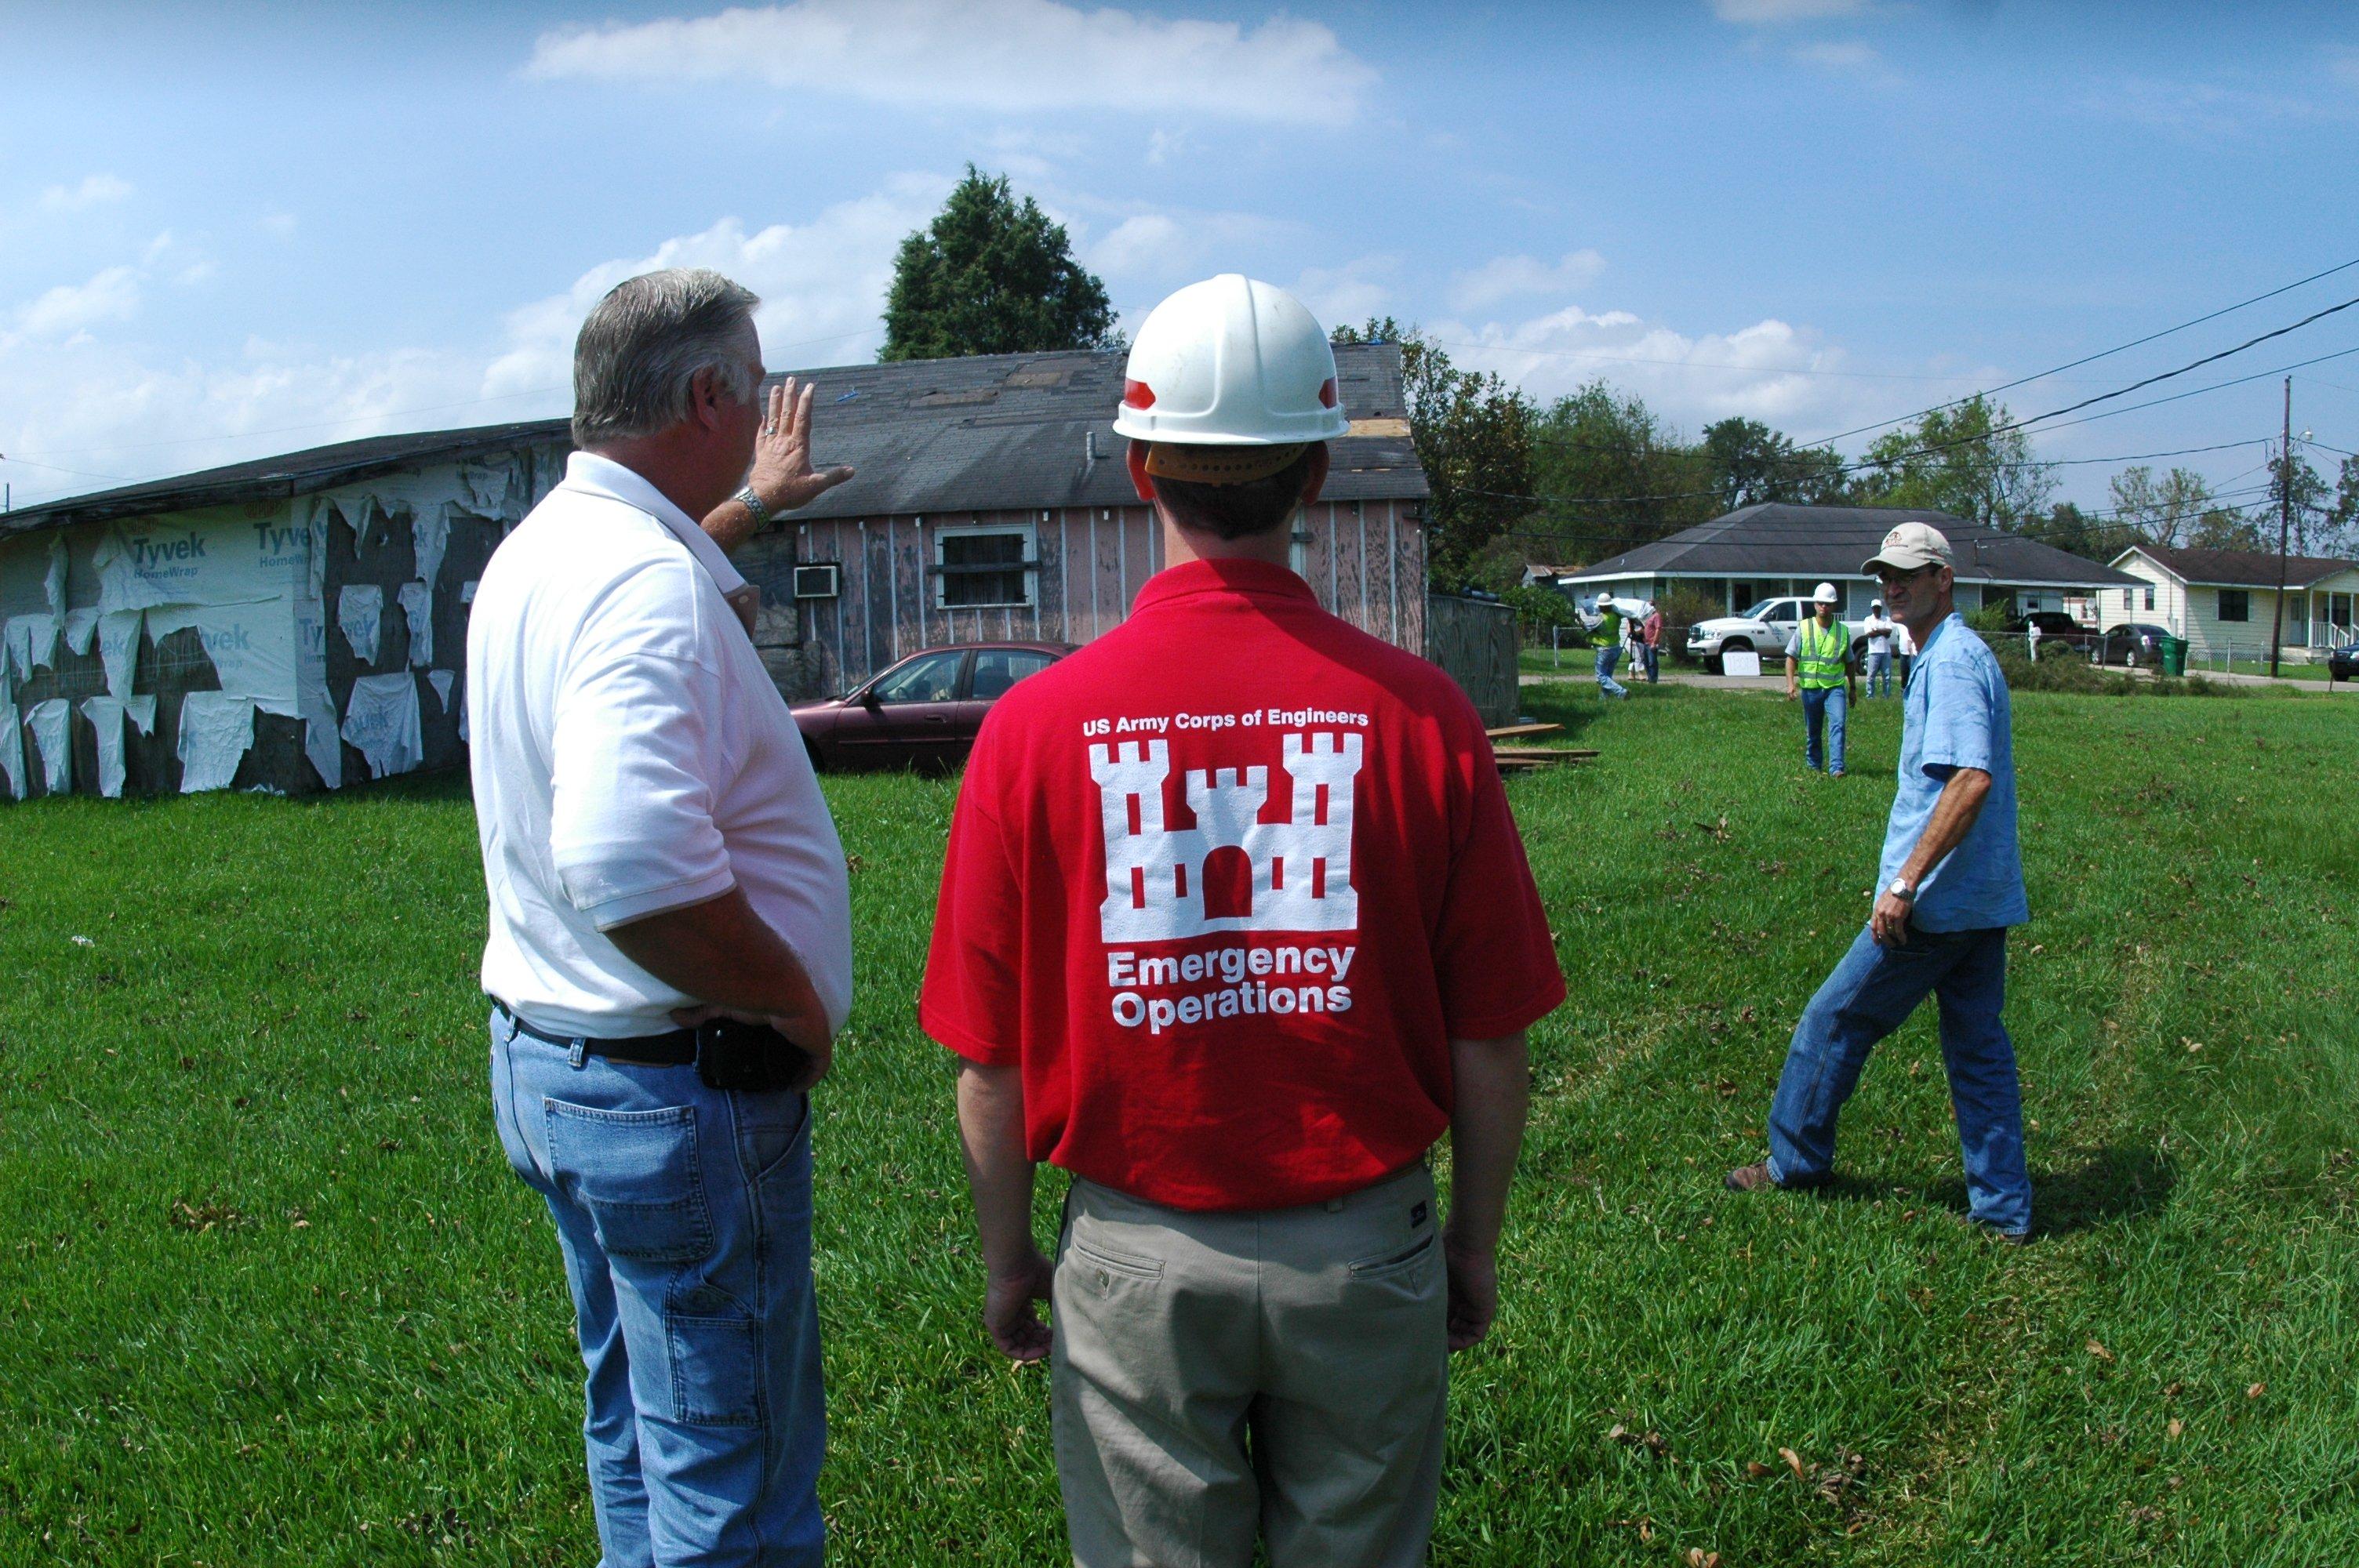 FEMA_-_38128_-_U_S_Army_Corps_of_Engineers_and_blue_tarp_contractor_in_Louisiana